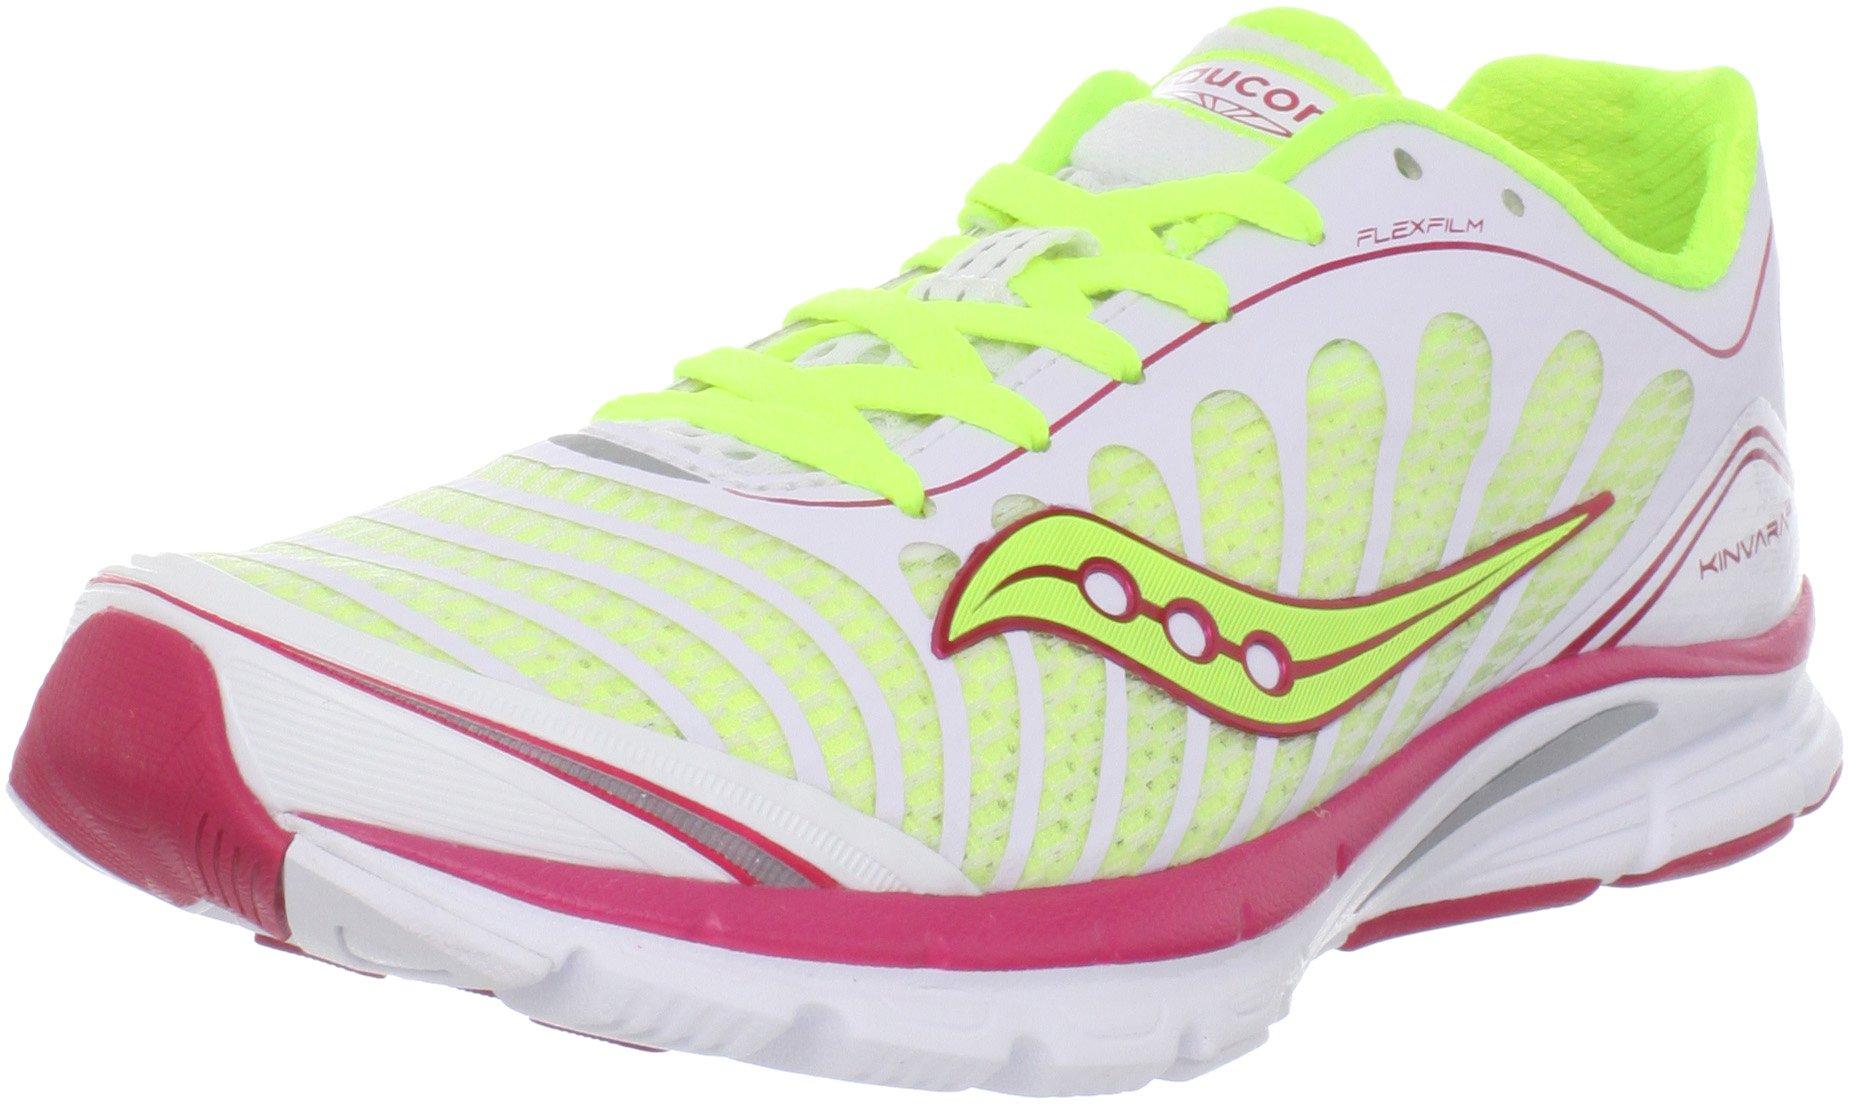 6d801a7bd796 Saucony Women s Progrid Kinvara 3 Running Shoe White Citron Pink 9.5 ...